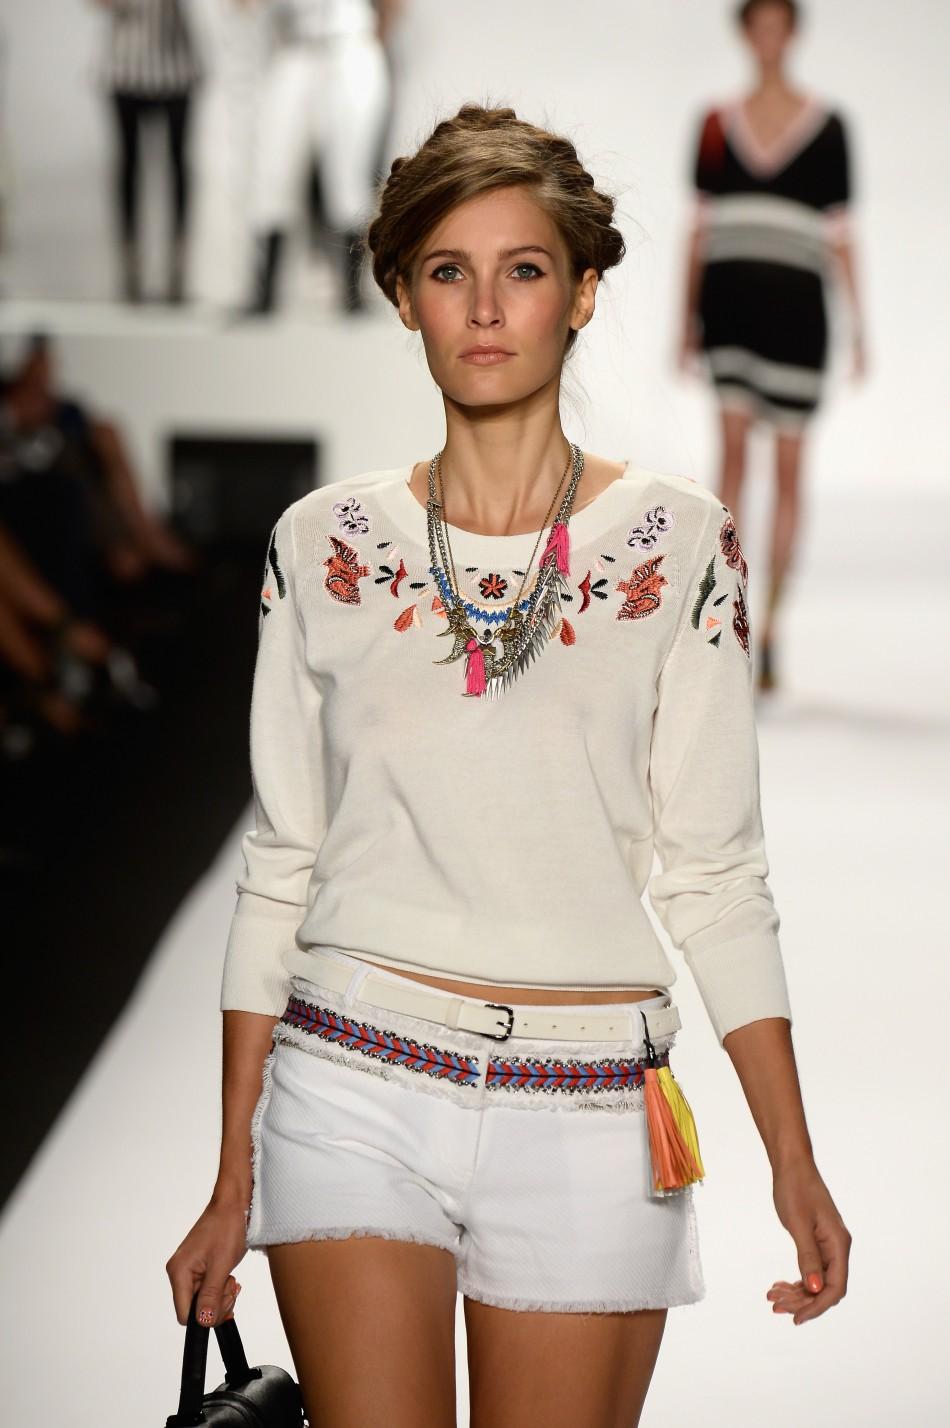 20579-rebecca-minkoff-spring-2014-new-york-fashion-week.jpg